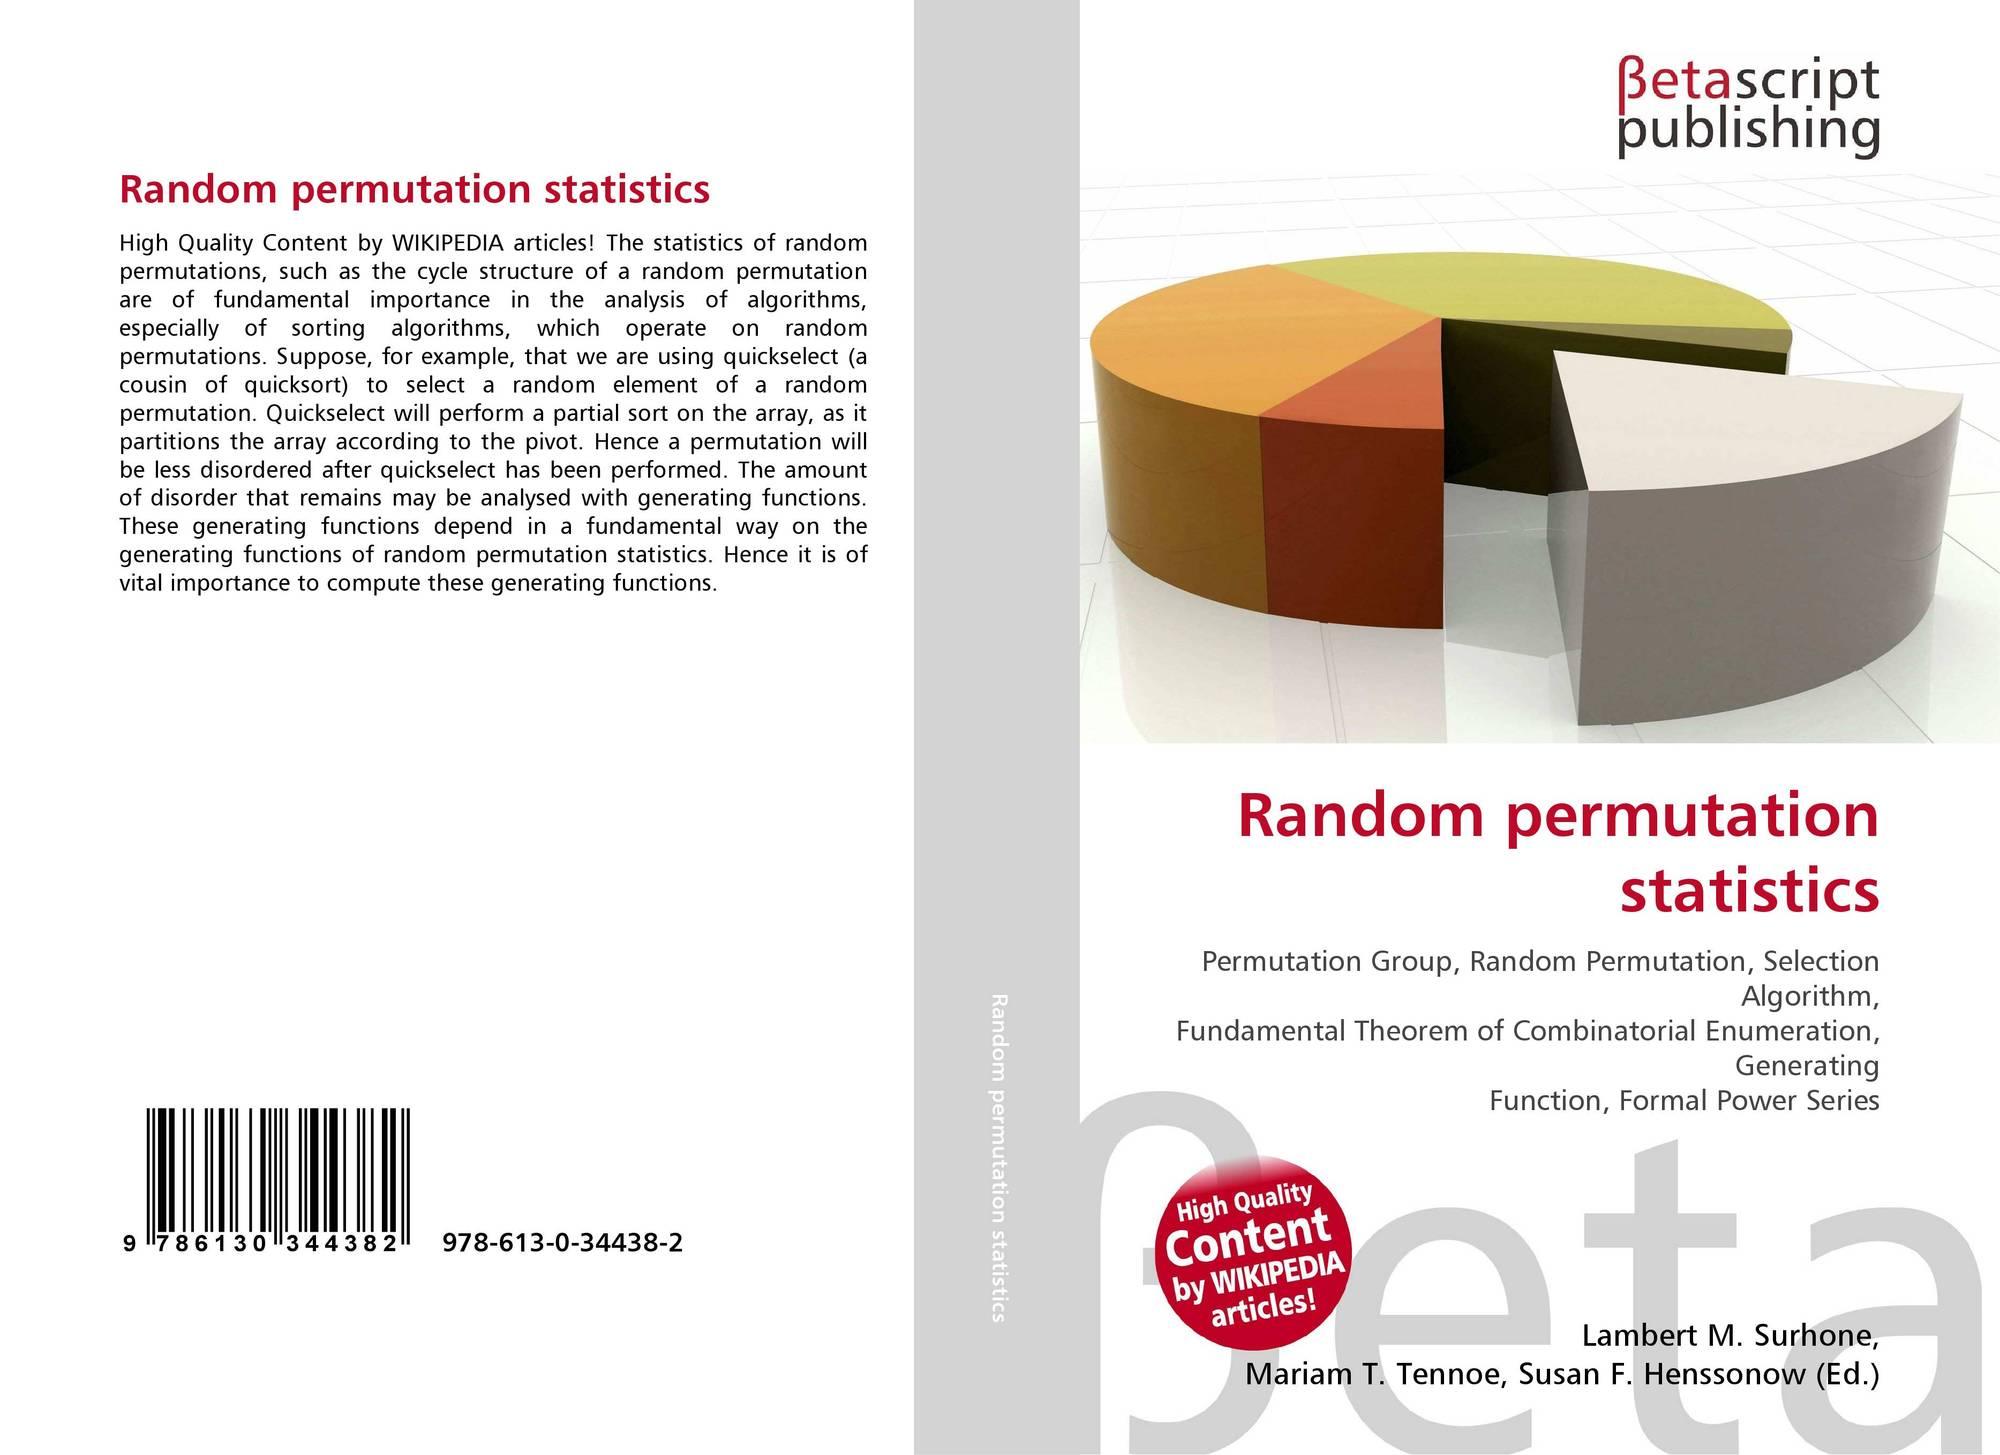 Random permutation statistics, 978-613-0-34438-2, 6130344384